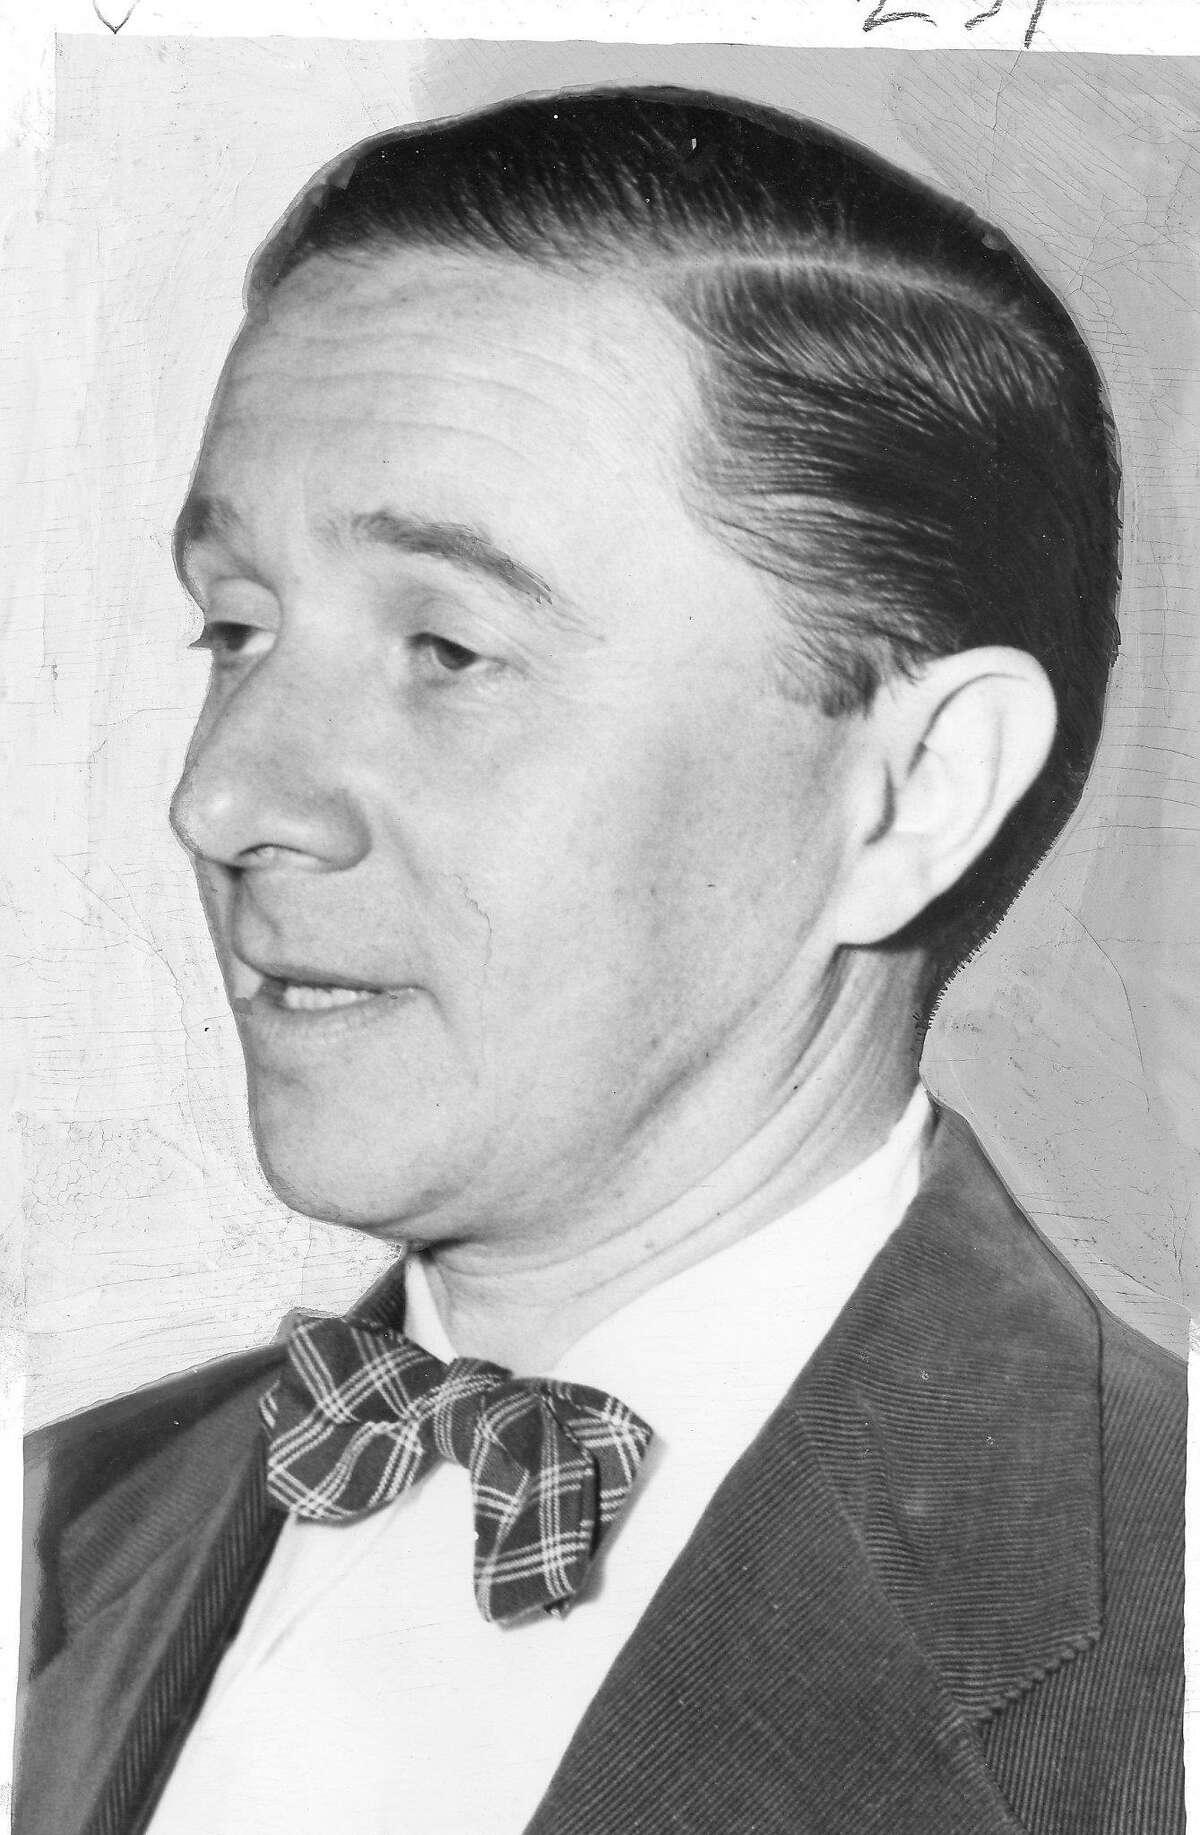 Anton Refregier, painter of the Rincon Annex murals, November 12, 1947 Photo ran 11/14/1947, p. 3